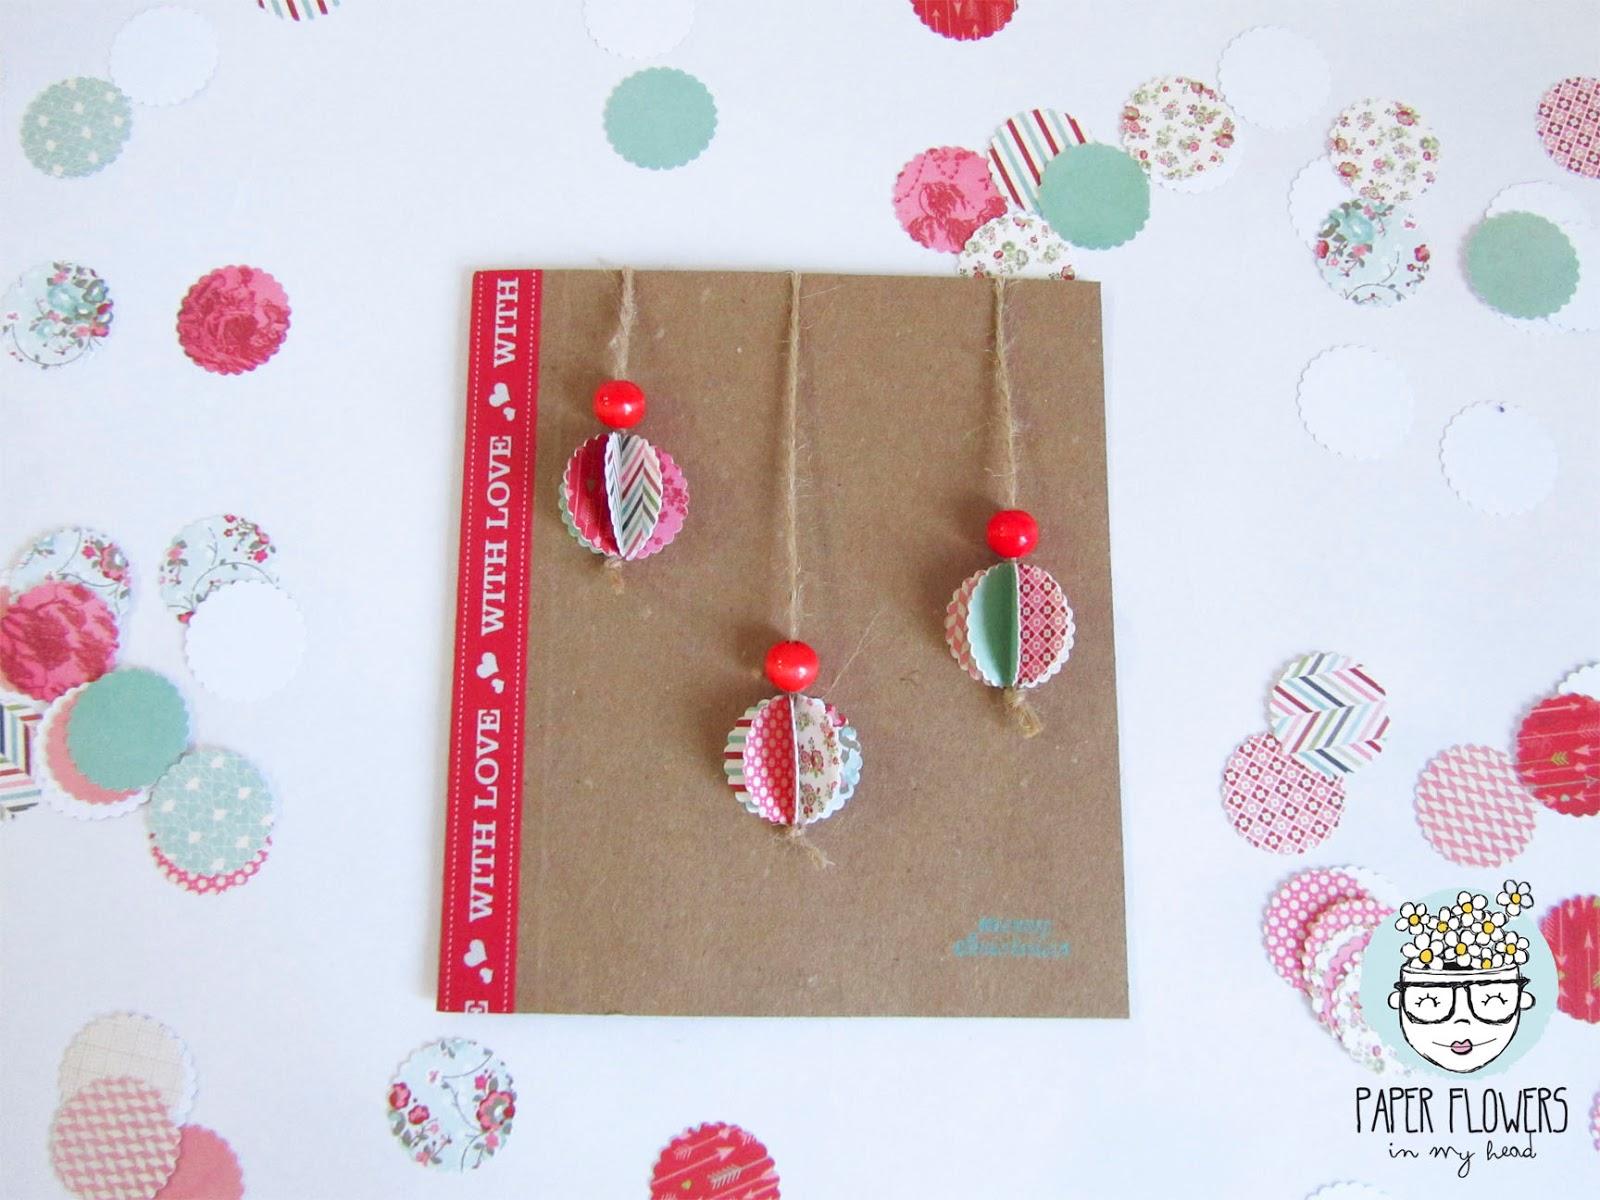 tarjetas de navidad 3d reciclando material paper flowers in my head - Tarjeta De Navidad En 3d